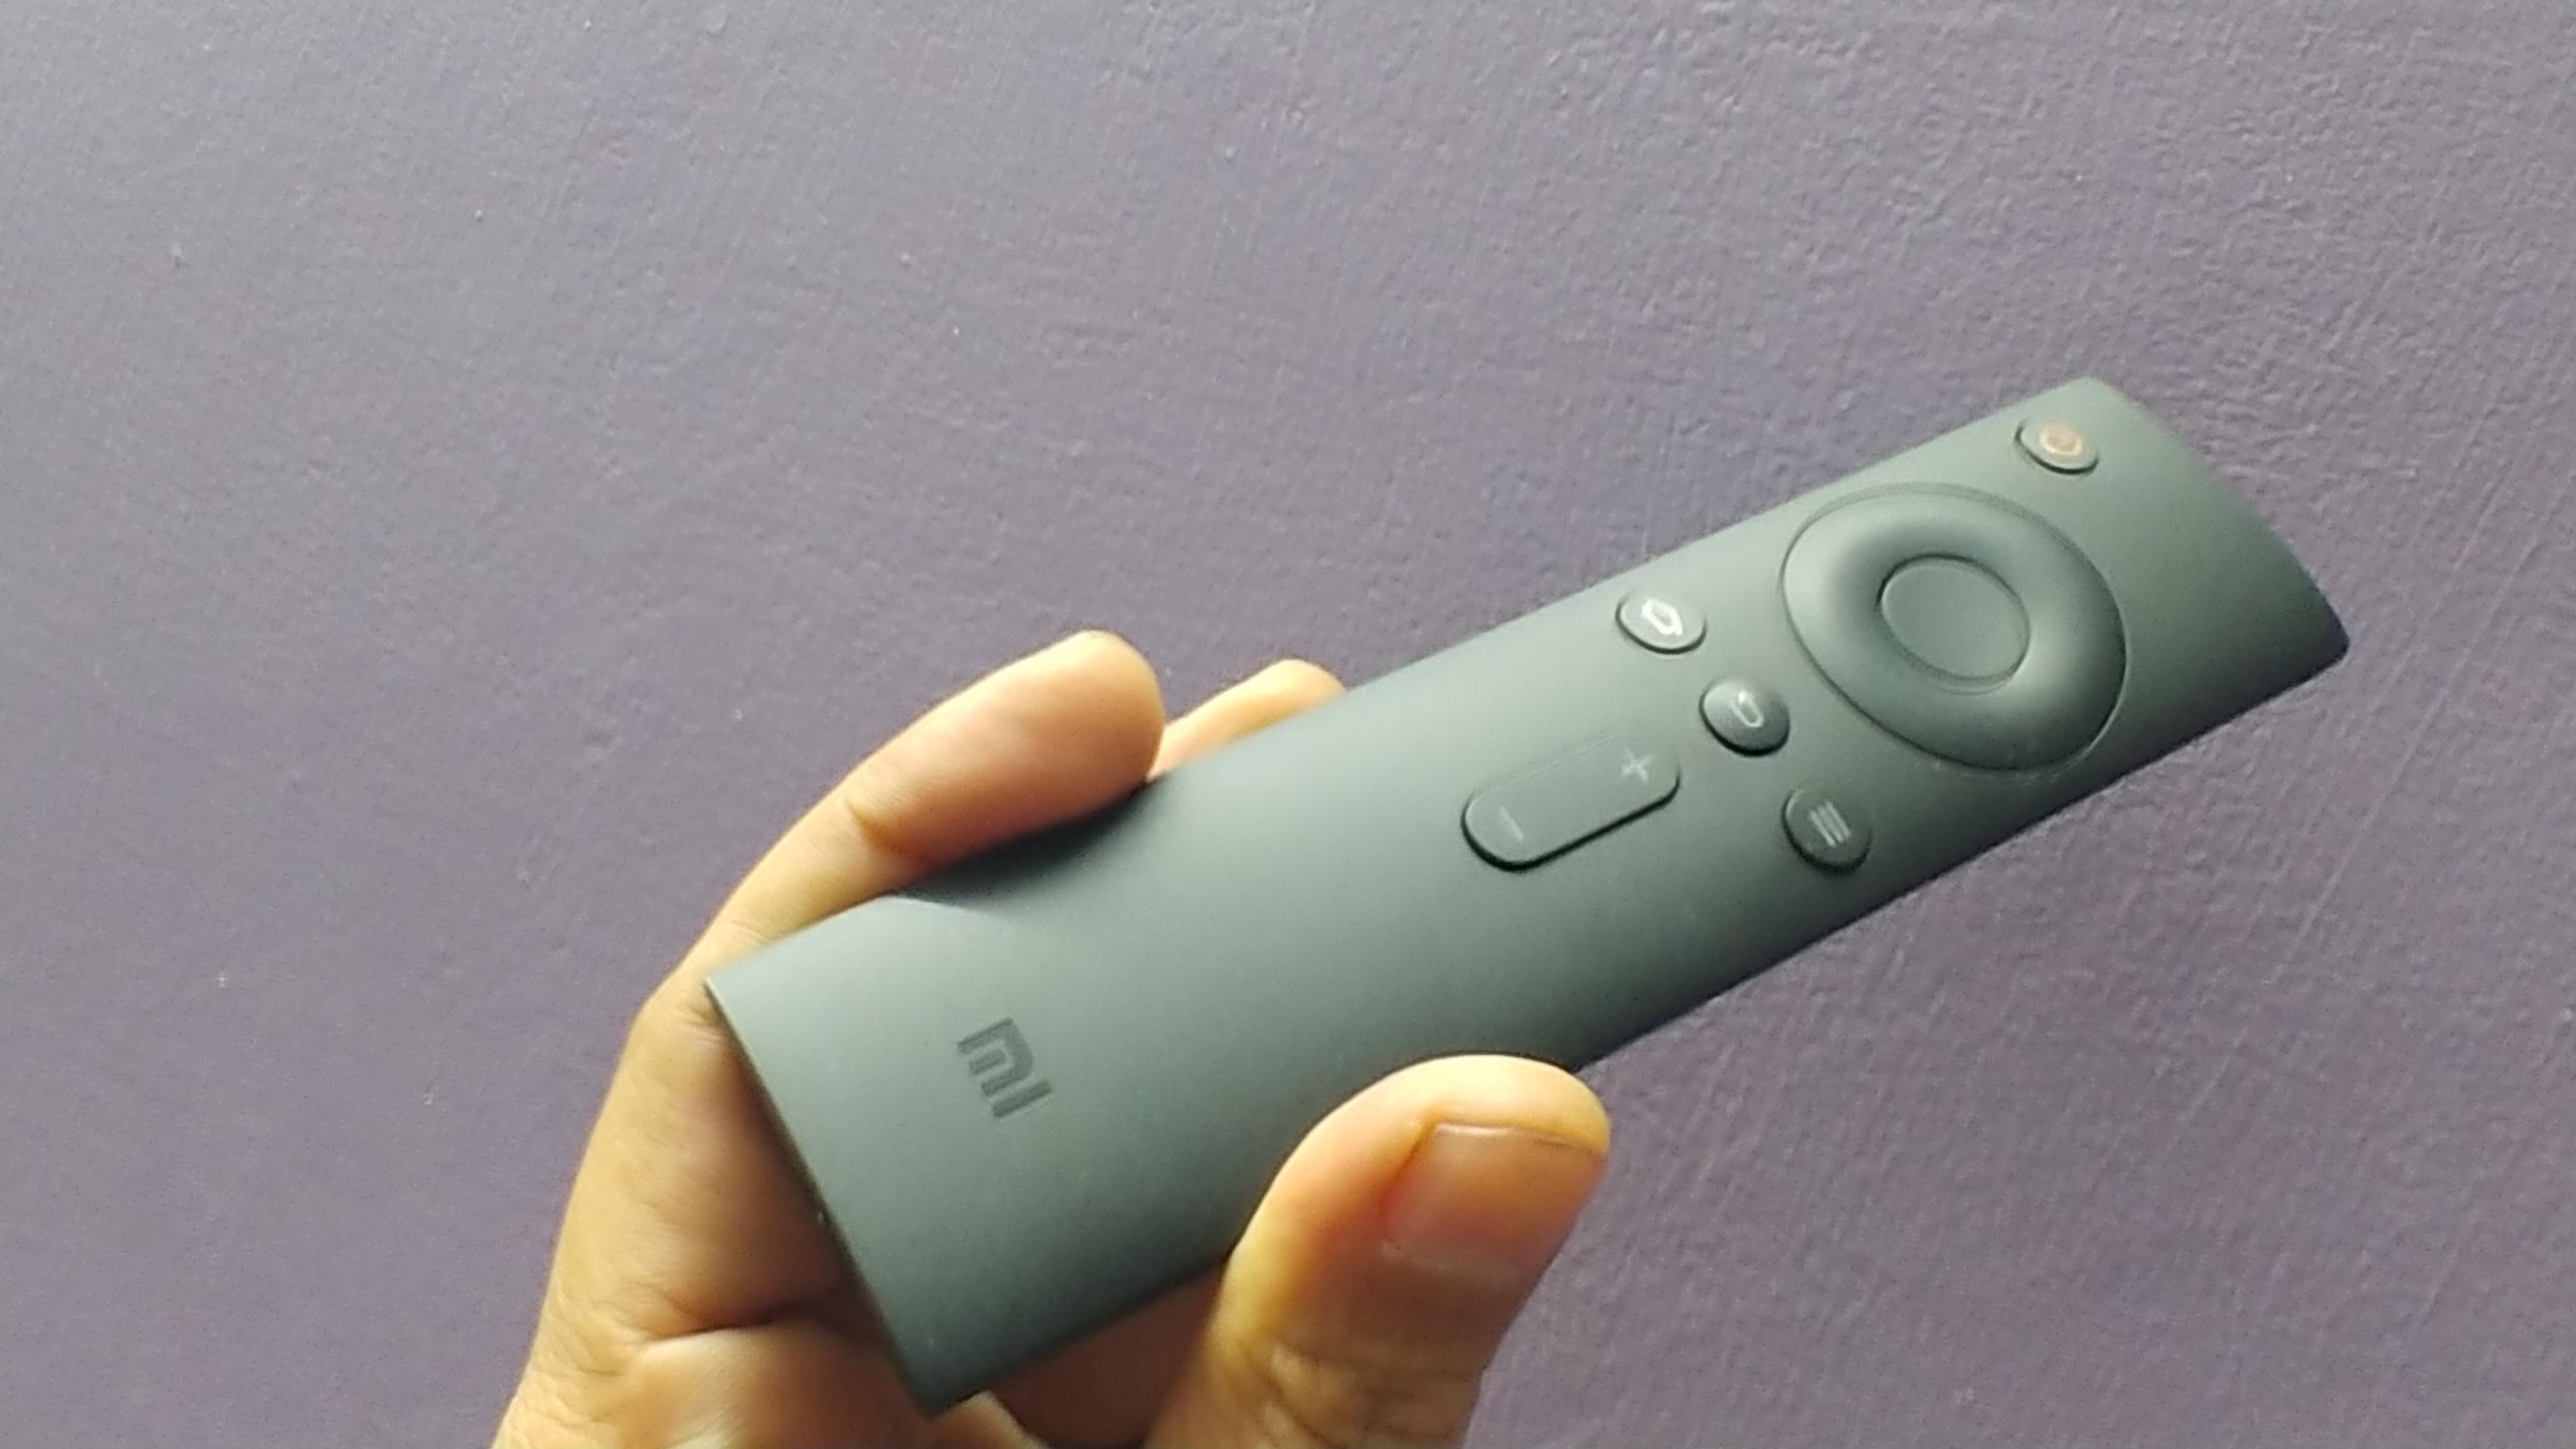 Xiaomi MI TV 4 Remote Control